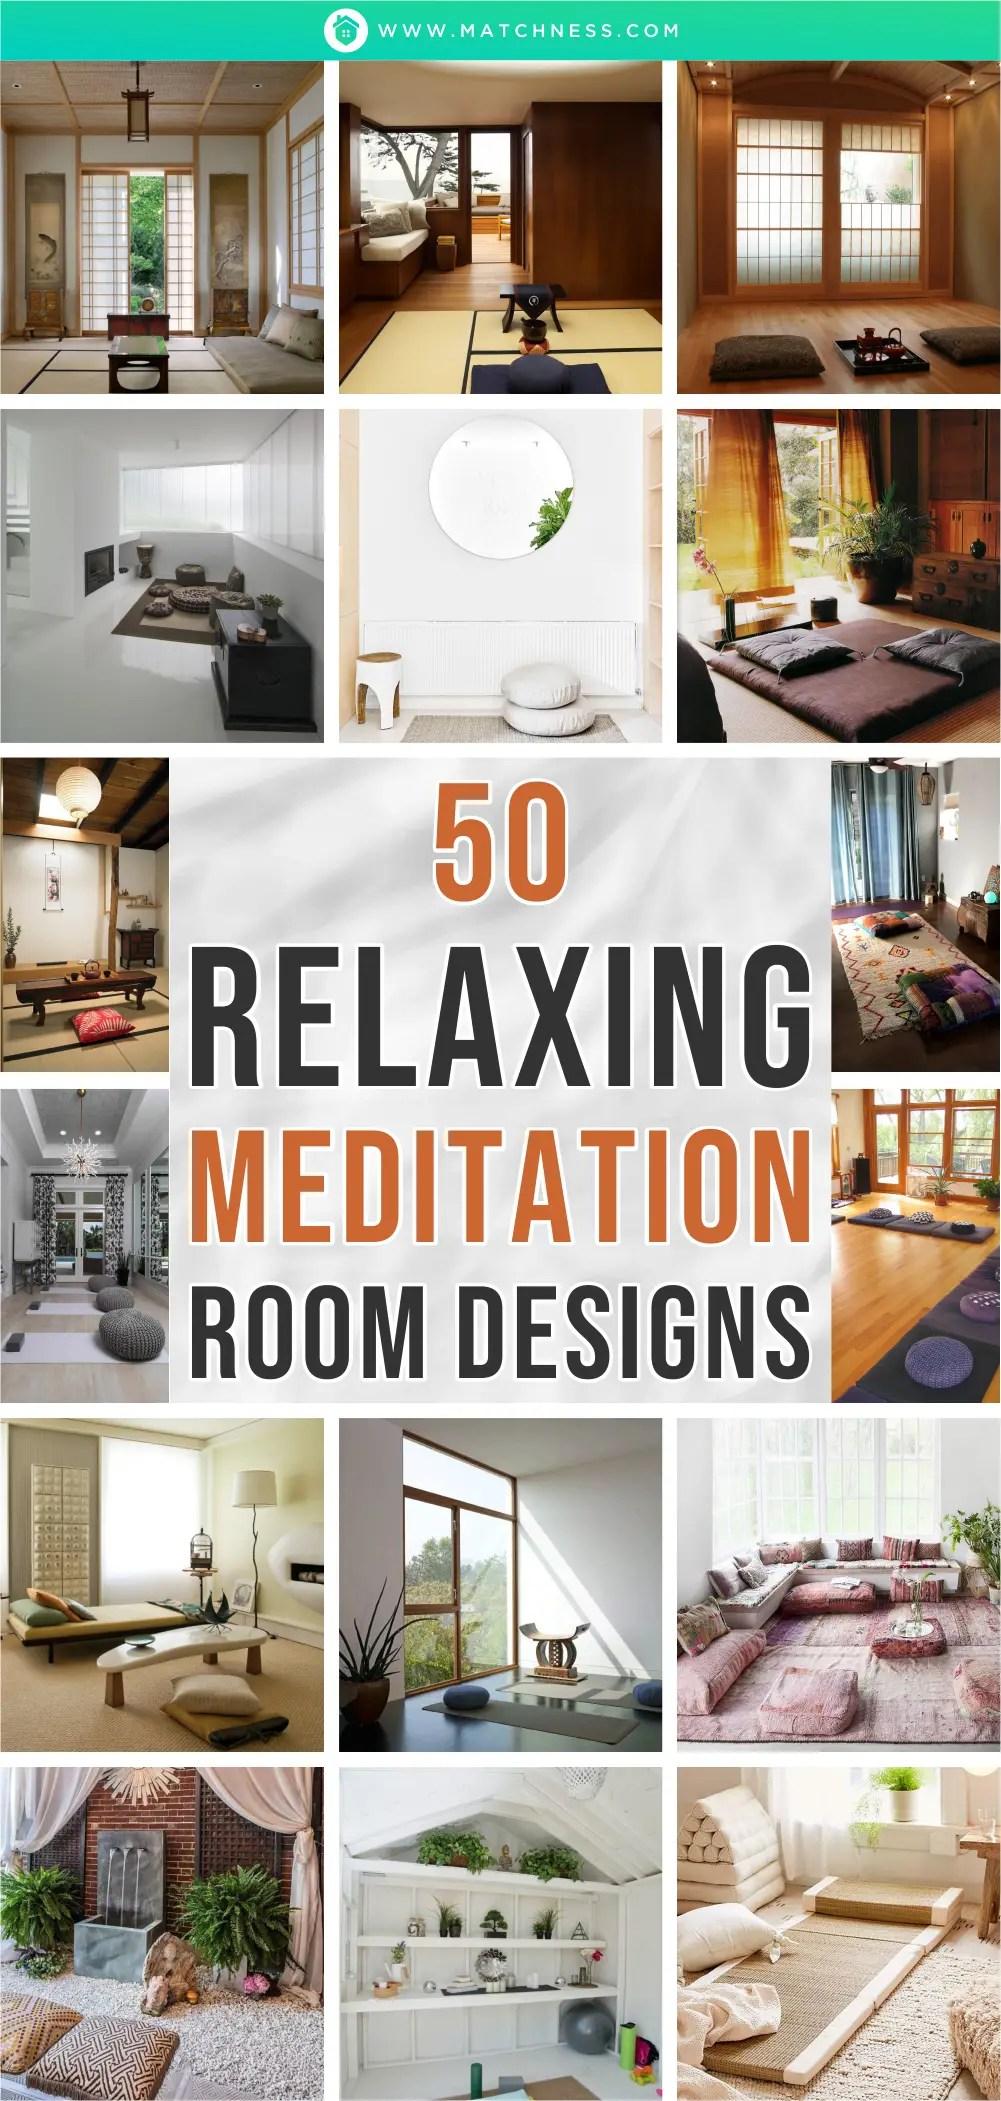 50 entspannende Meditationsraum-Designs ~ Matchness.com